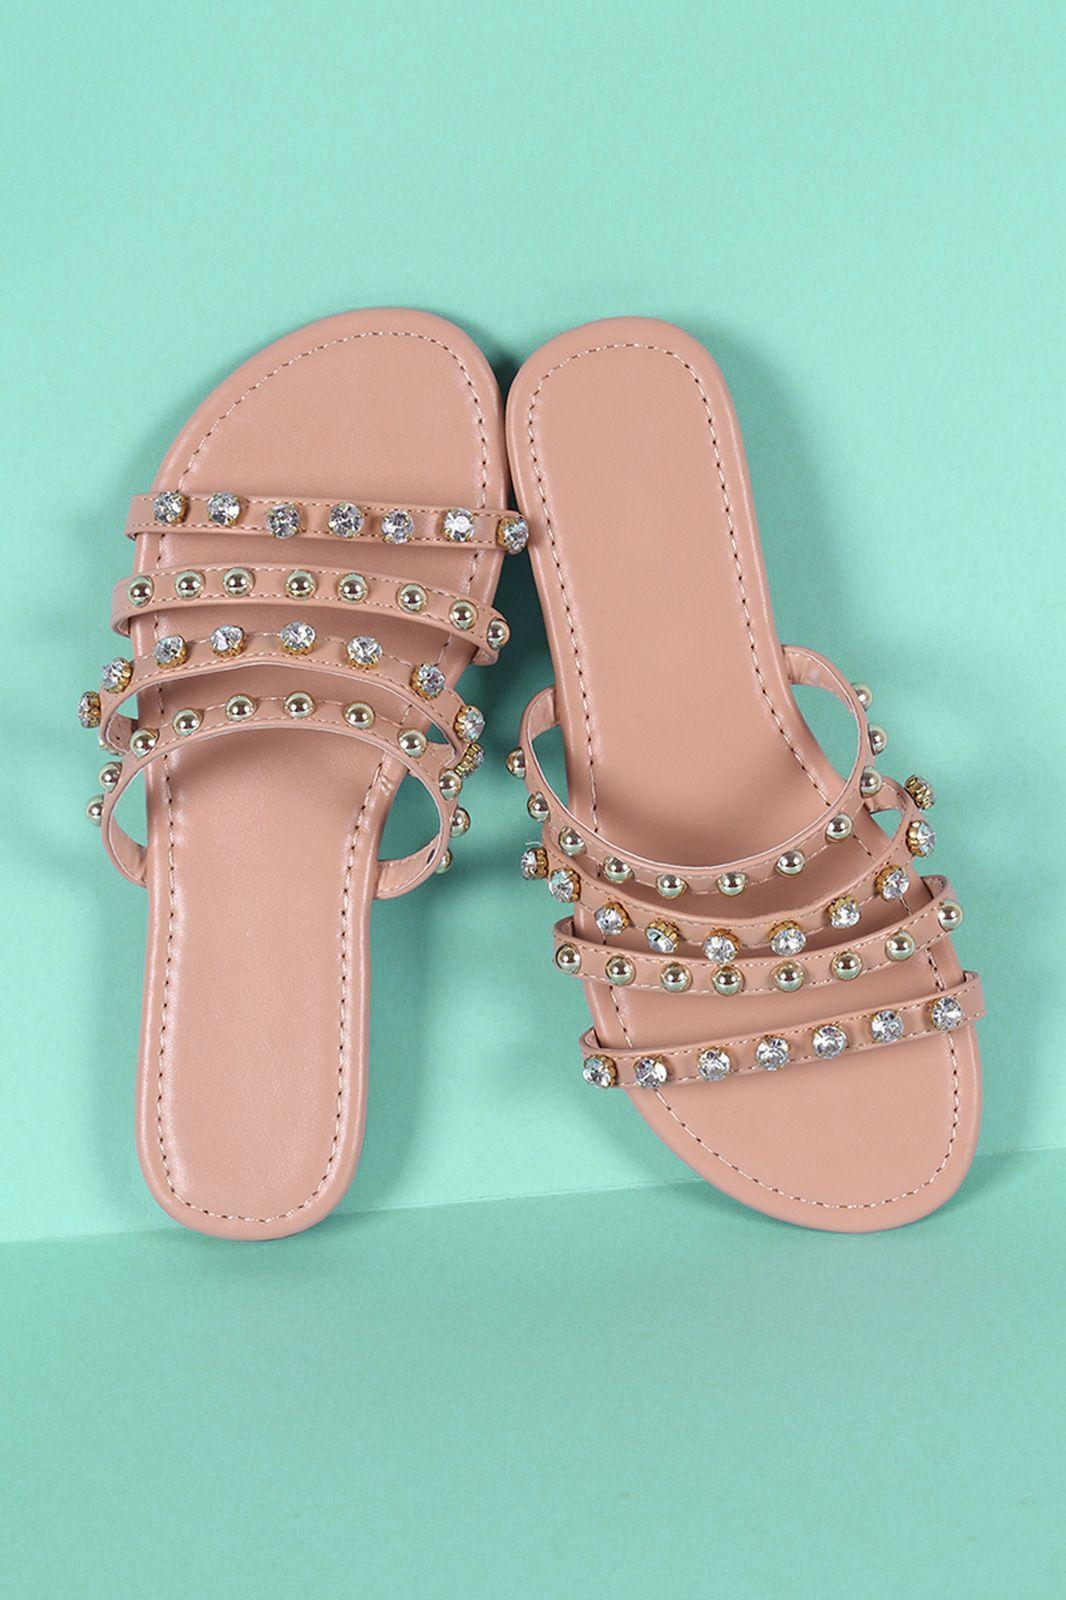 1112261dc9022f Studs And Jewels Slide Sandal